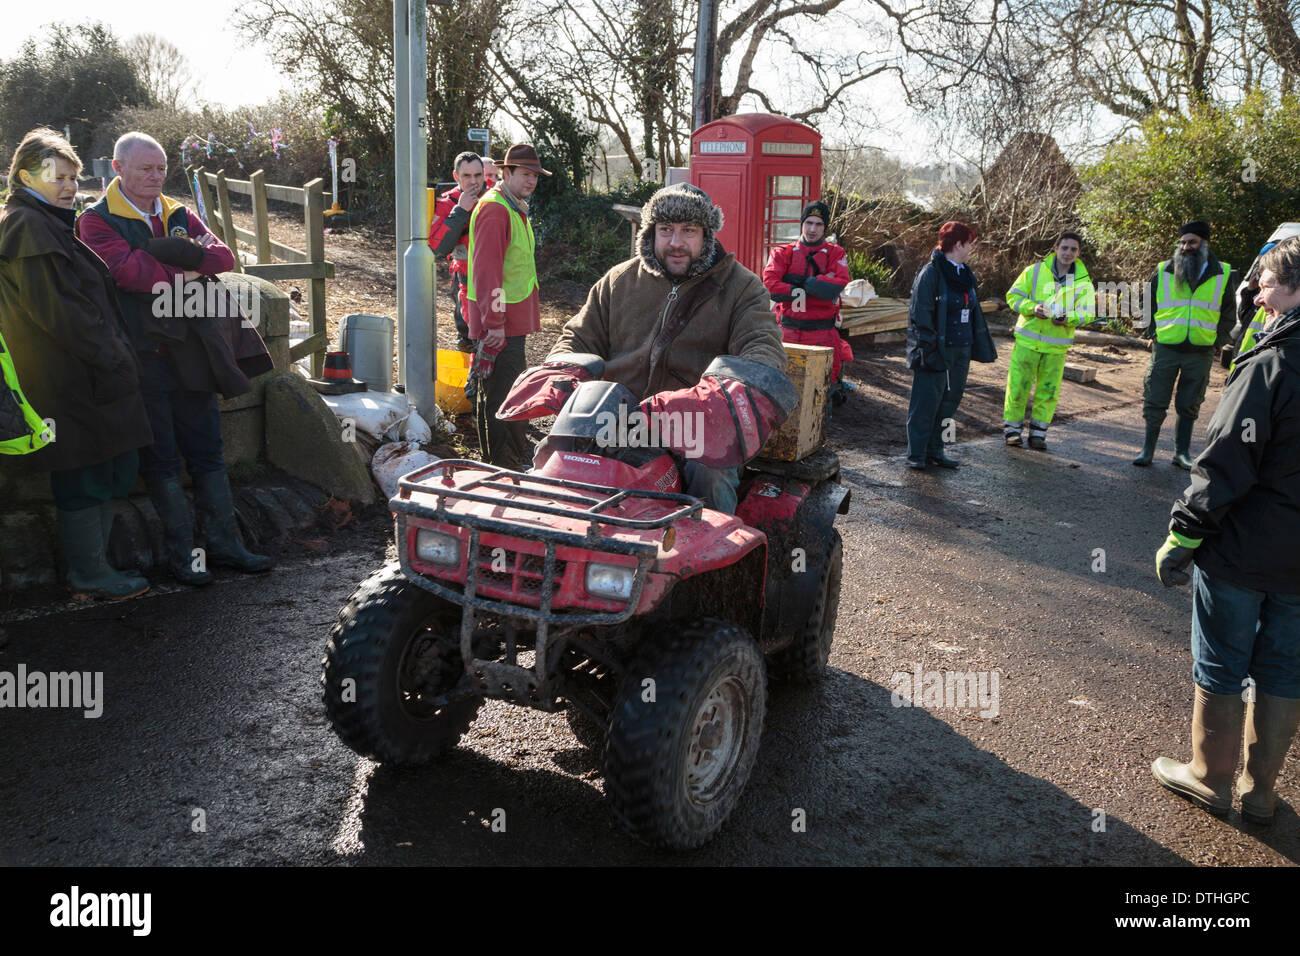 Pub landlord Jim Winkworth of the King Alfred Inn runs errands on his quad bike to help local flood victims at Burrowbridge. - Stock Image